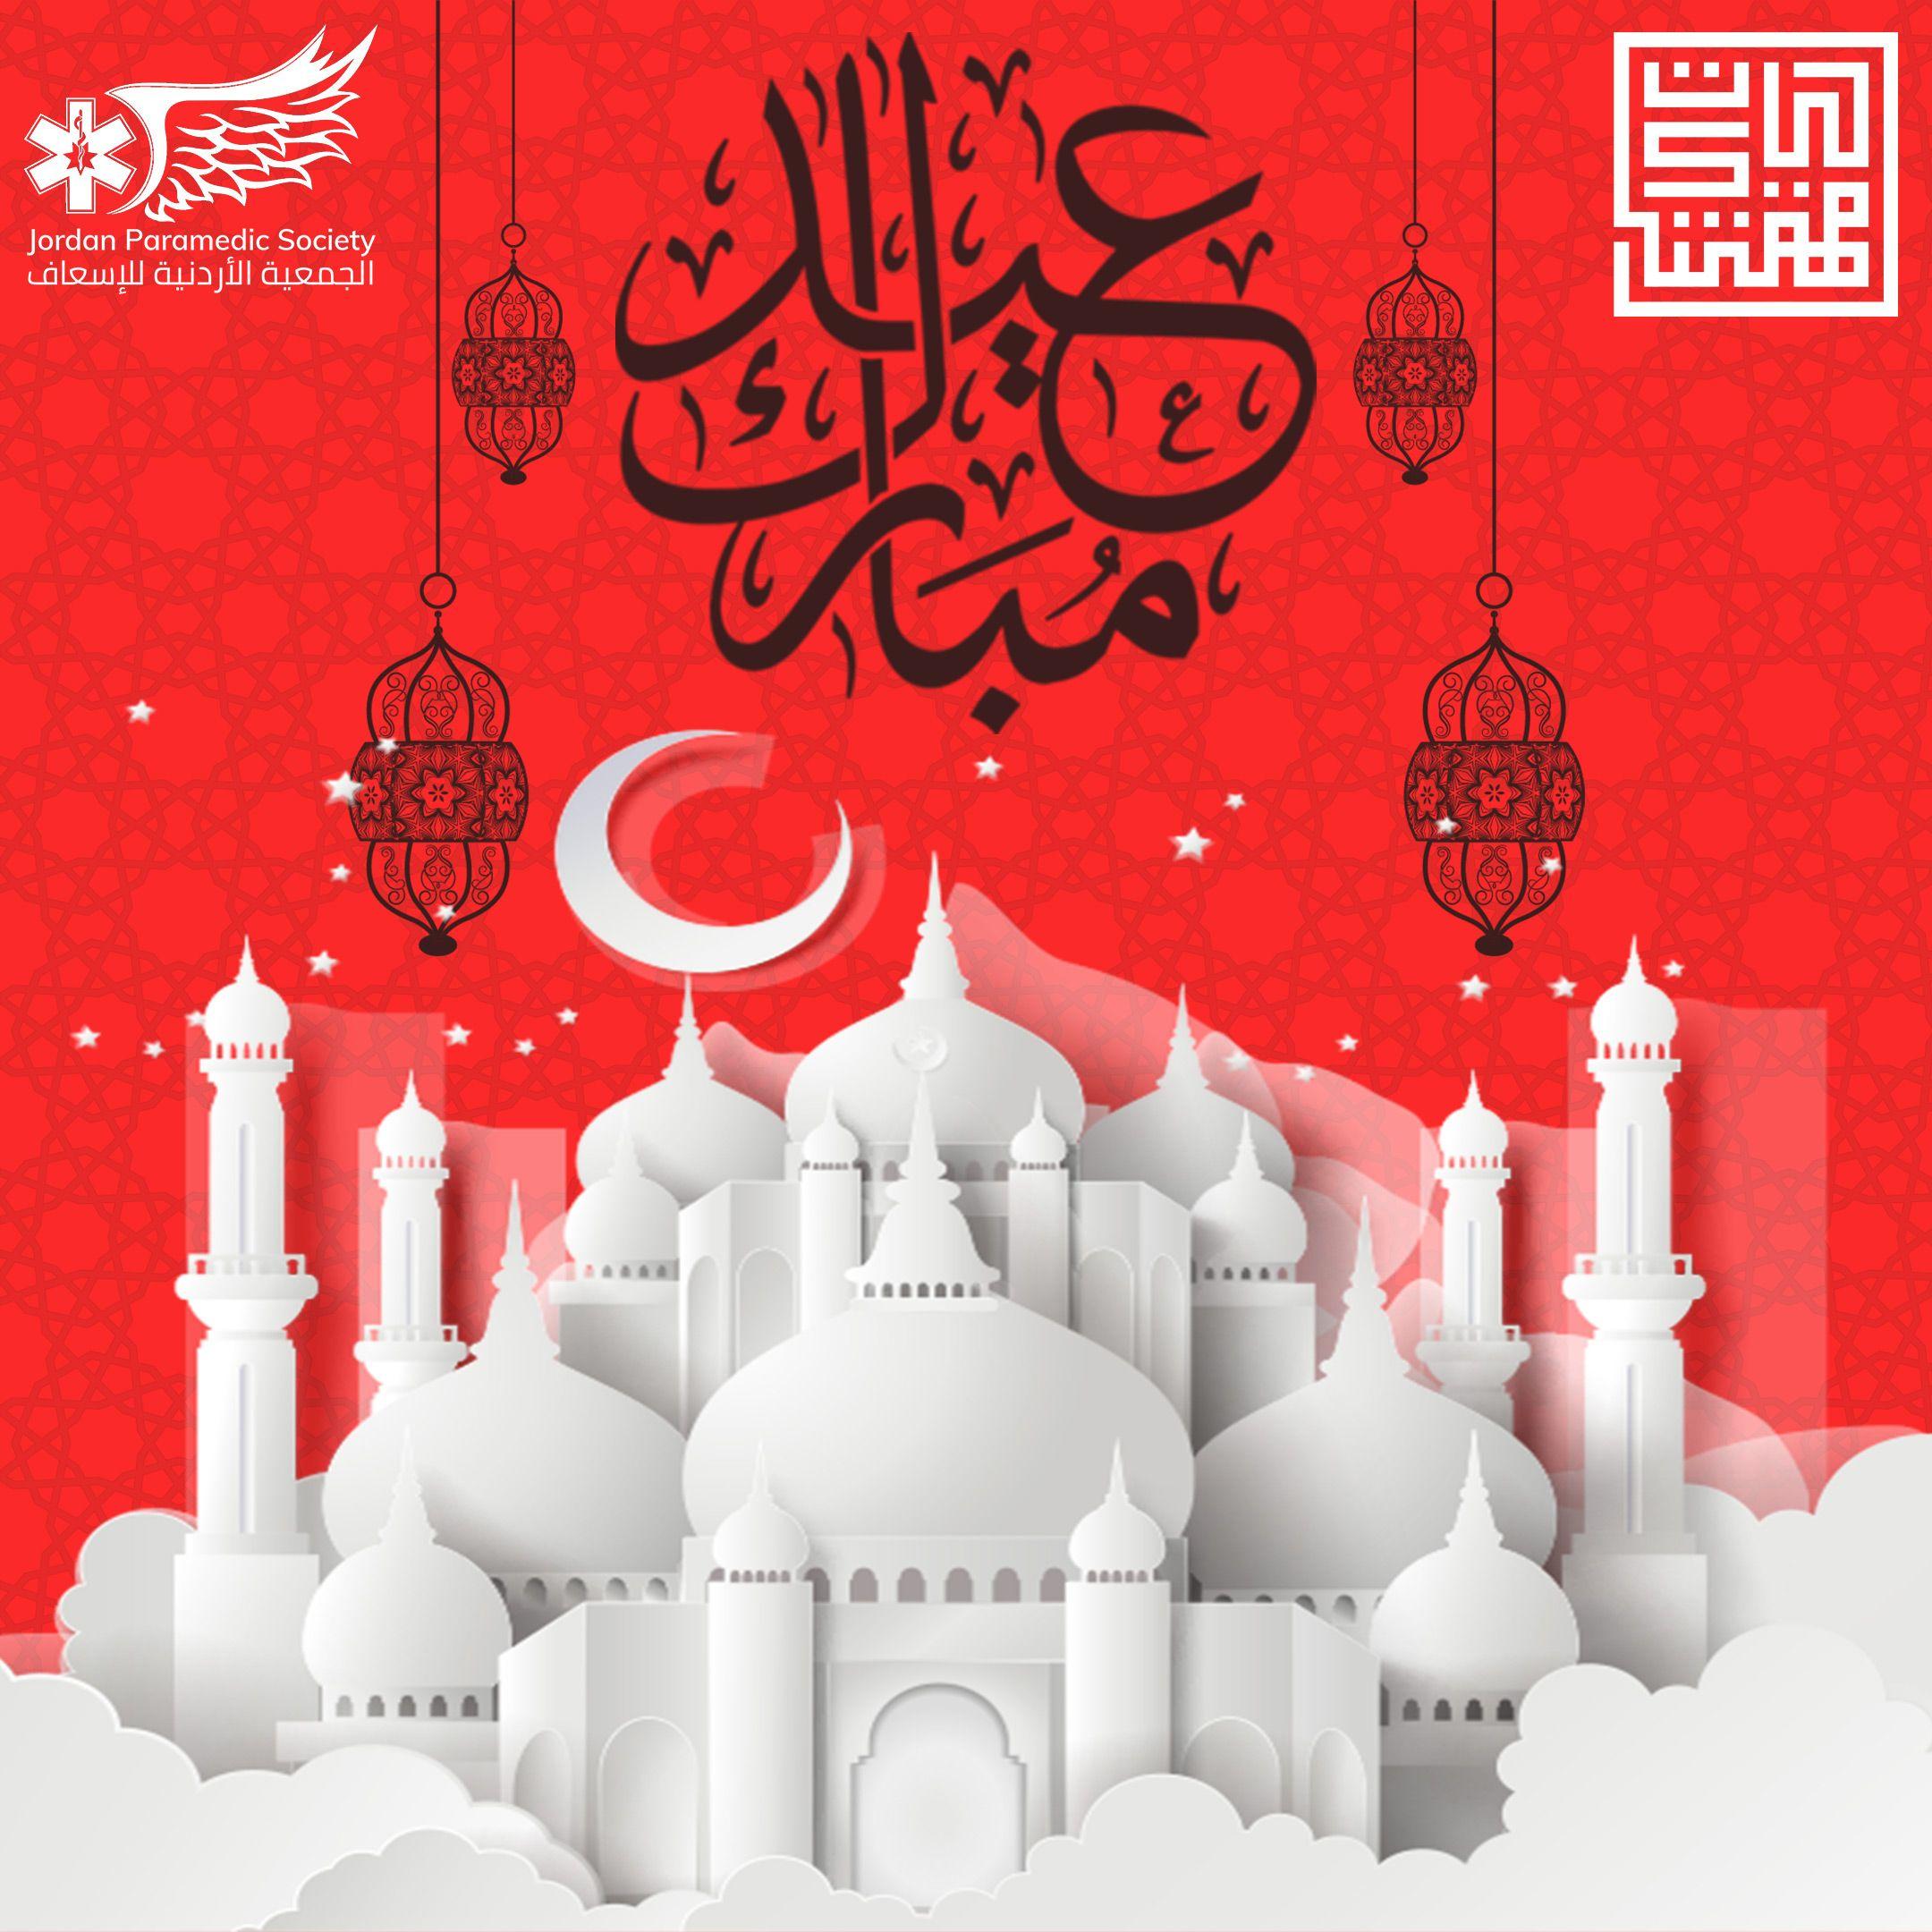 Happy Adha Eid عيد أضحى مبارك Home Decor Decals Ceiling Lights Decor